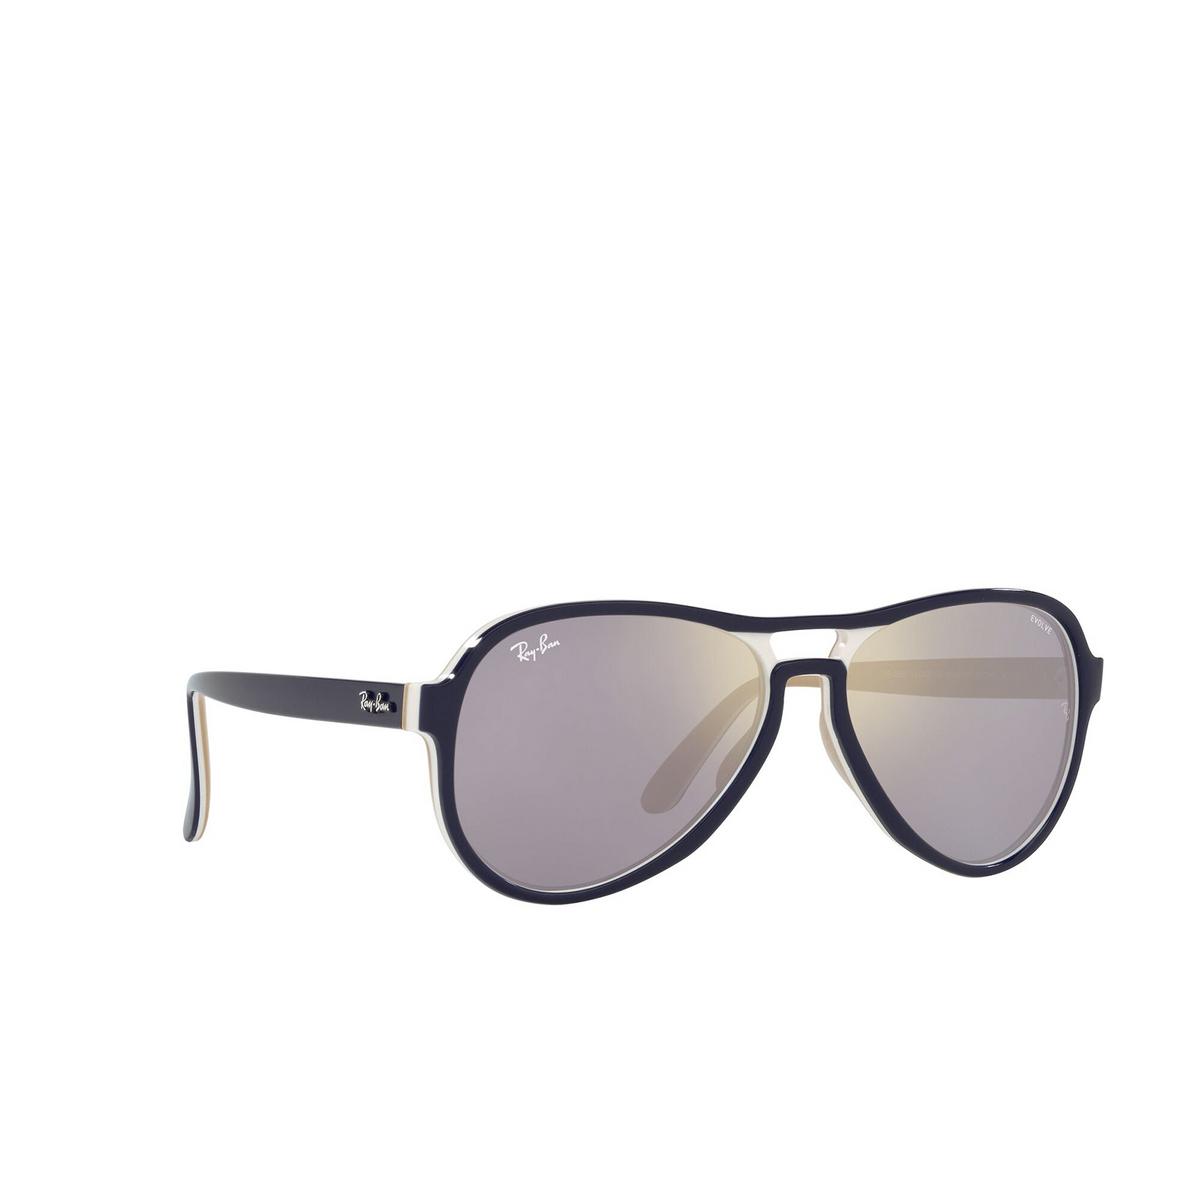 Ray-Ban® Aviator Sunglasses: Vagabond RB4355 color Blue Creamy Light Brown 6548B3 - three-quarters view.